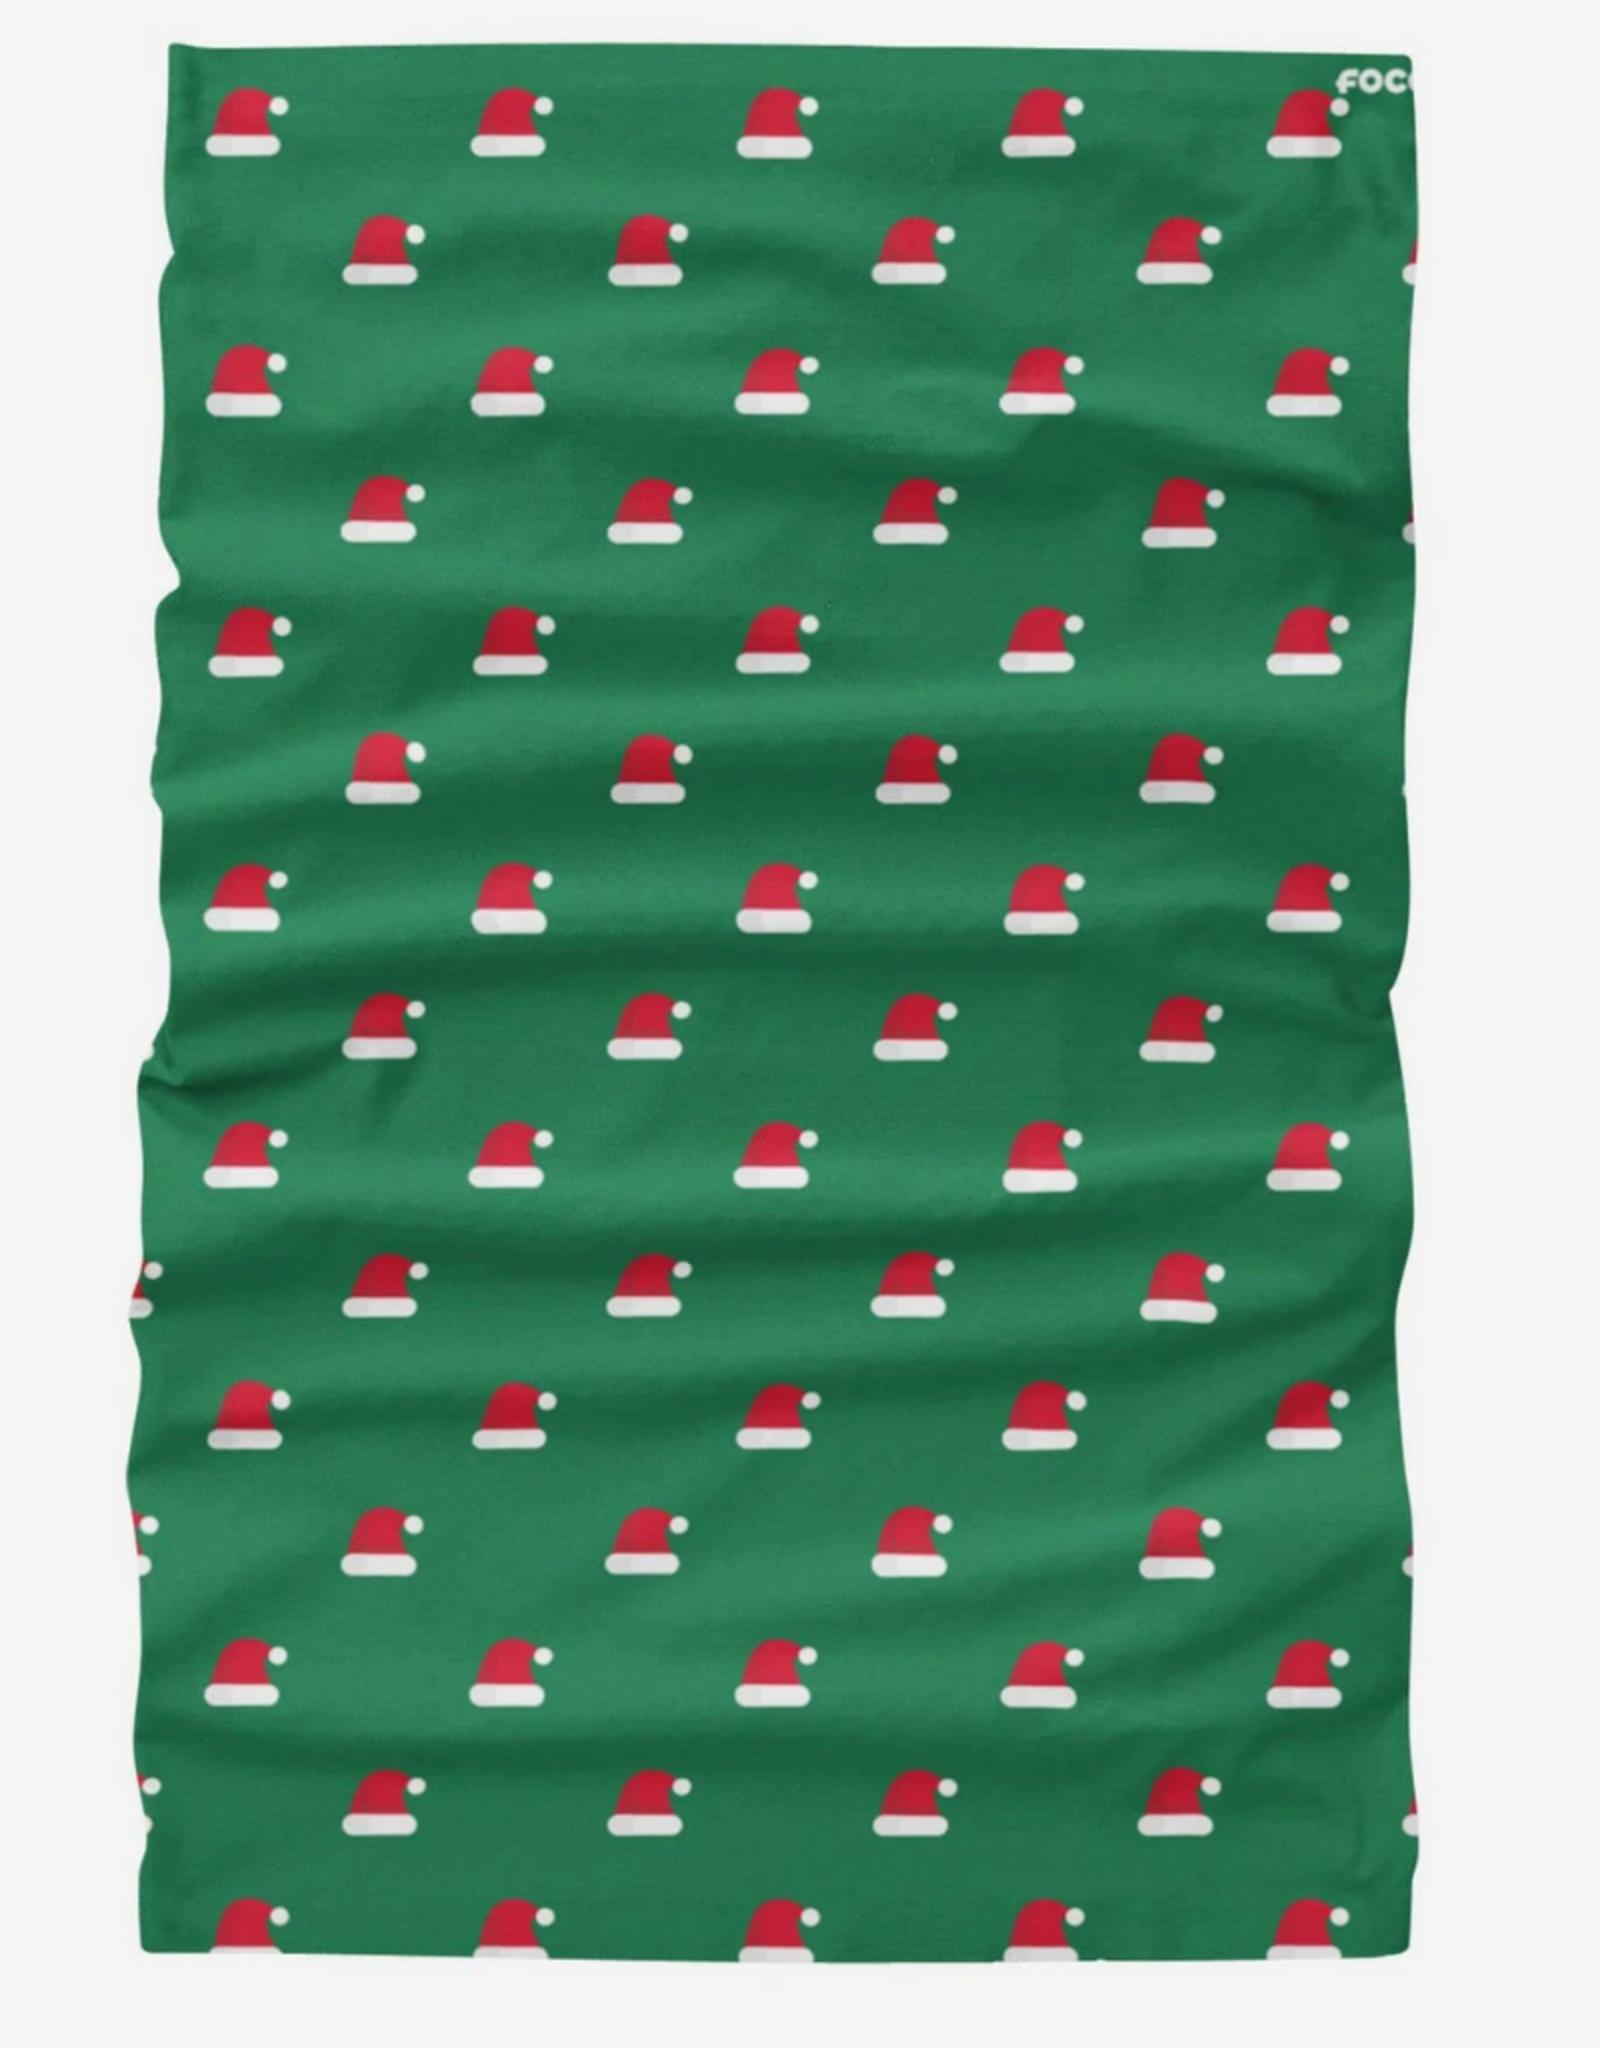 FOCO FOCO Adult Mini Santa Hats Gaiter